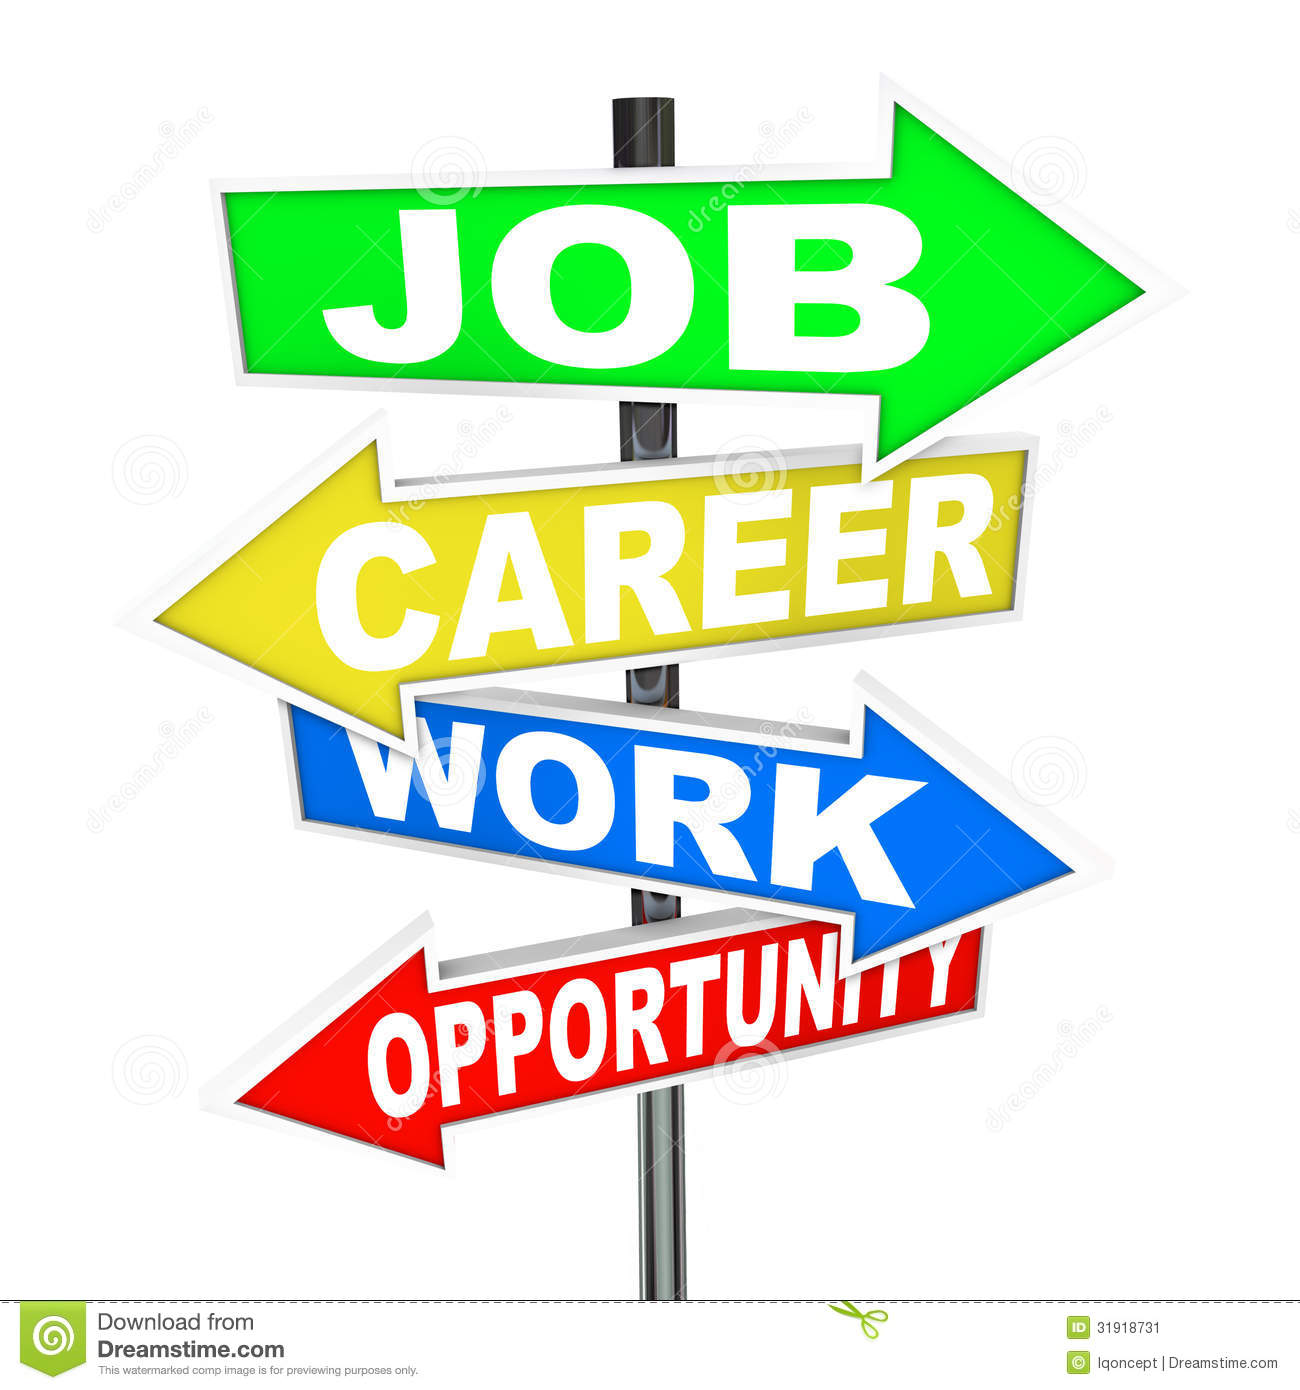 Job Opportunity Clipart-Job Opportunity Clipart-18